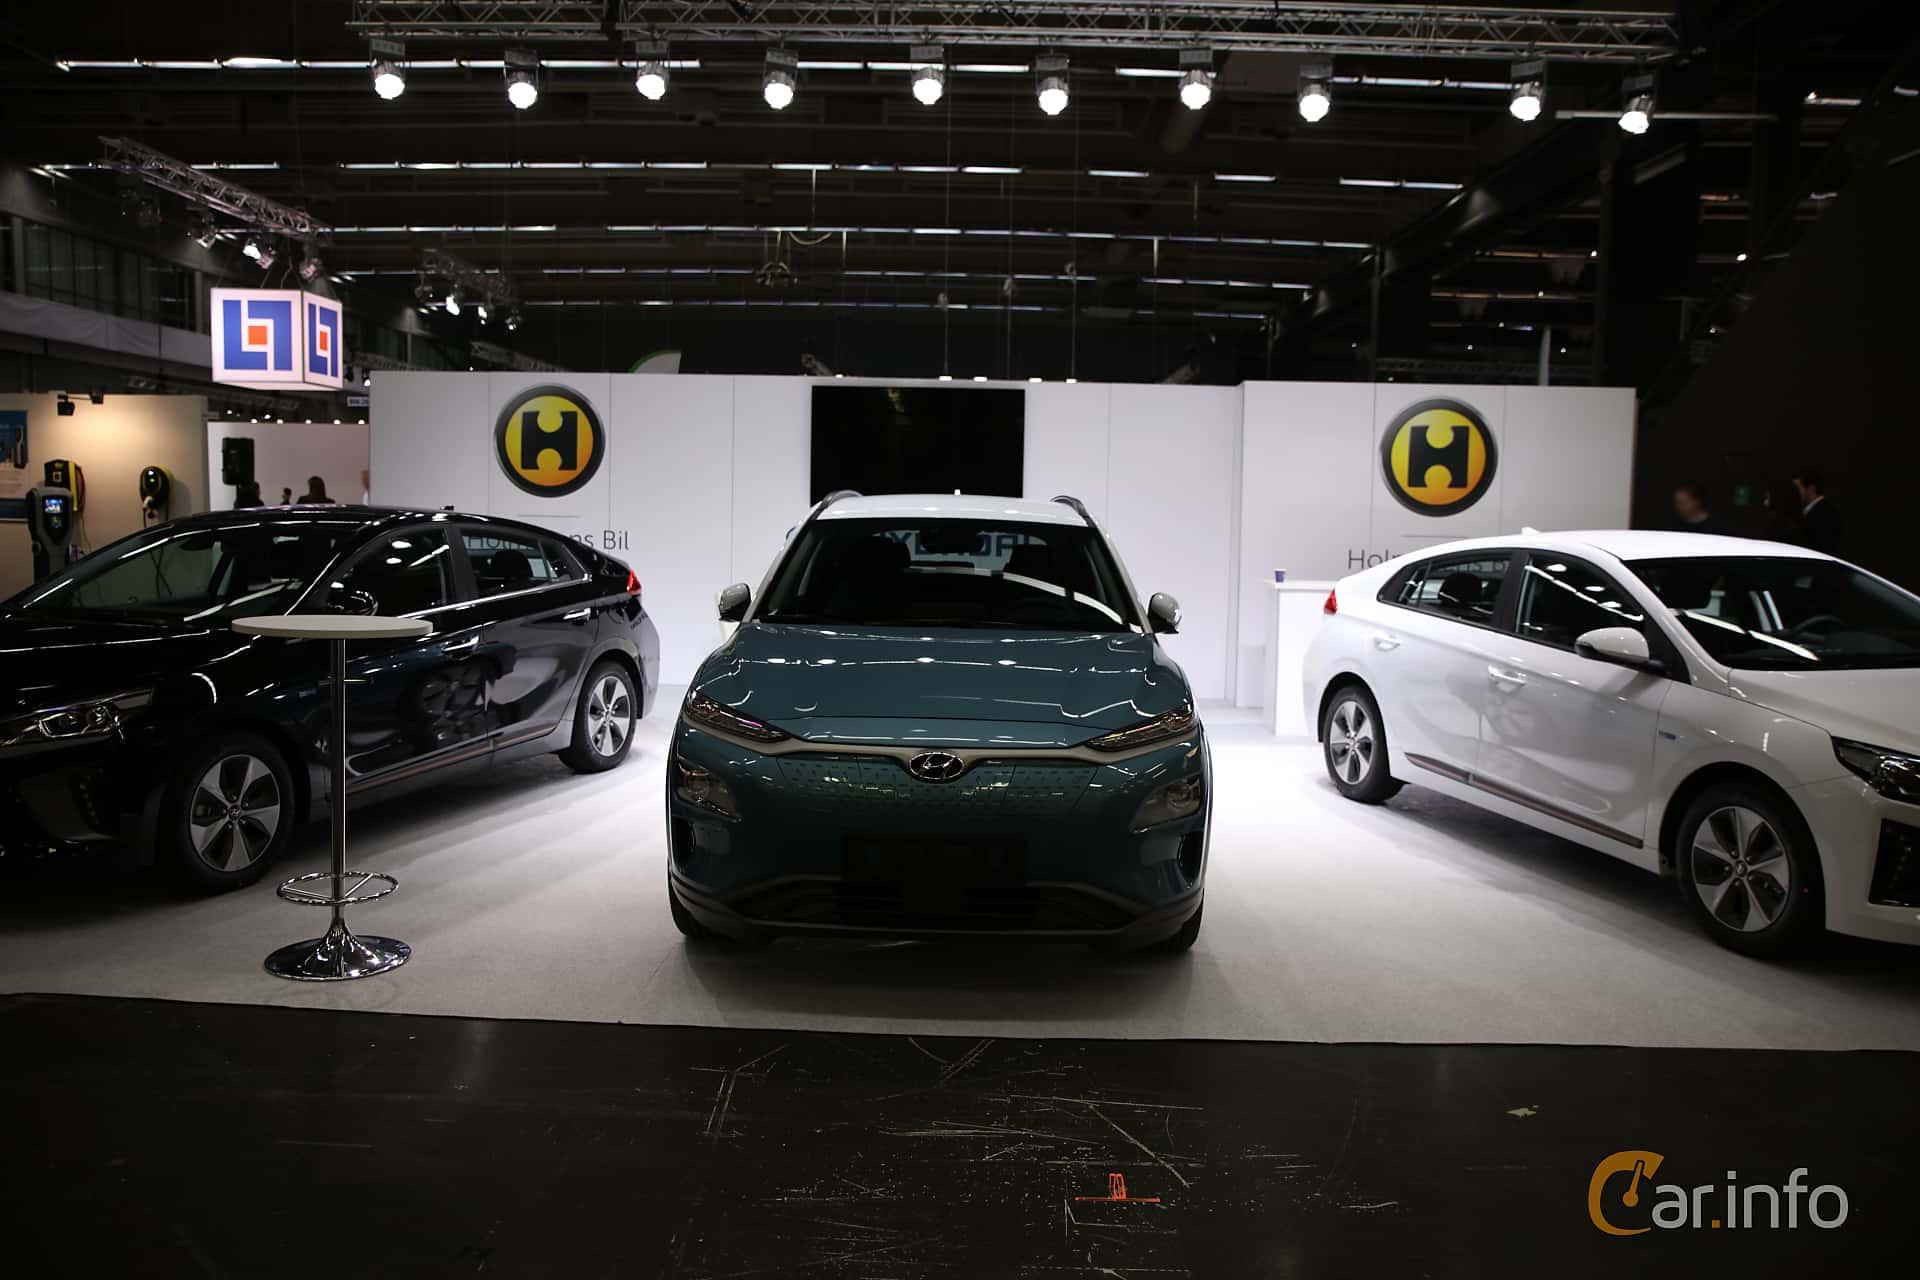 Hyundai Kona Electric 64 kWh Single Speed, 204hp, 2019 at eCar Expo Göteborg 2018